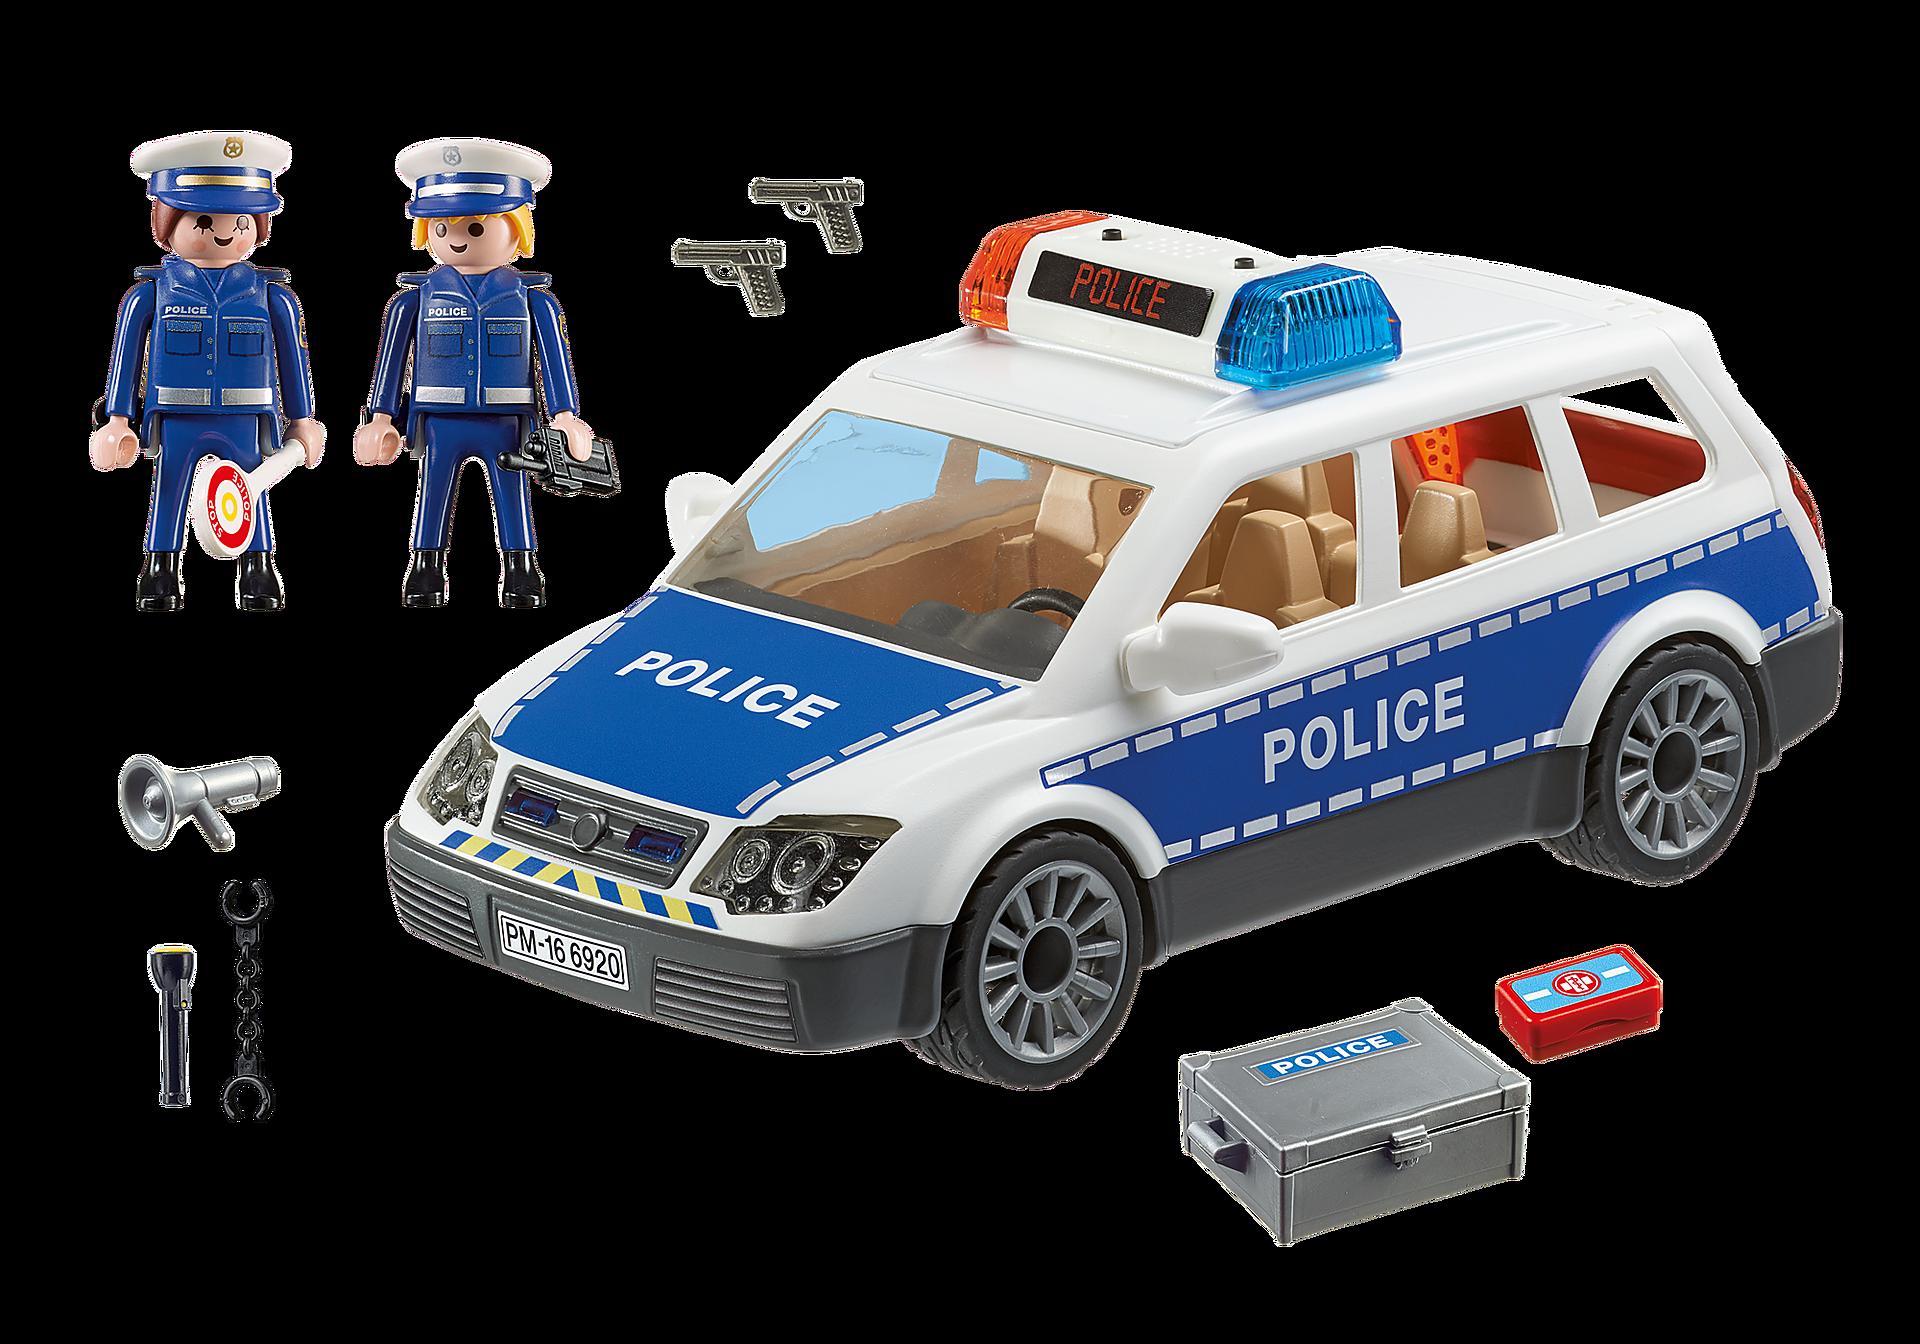 http://media.playmobil.com/i/playmobil/6873_product_box_back/Polizei-Einsatzwagen